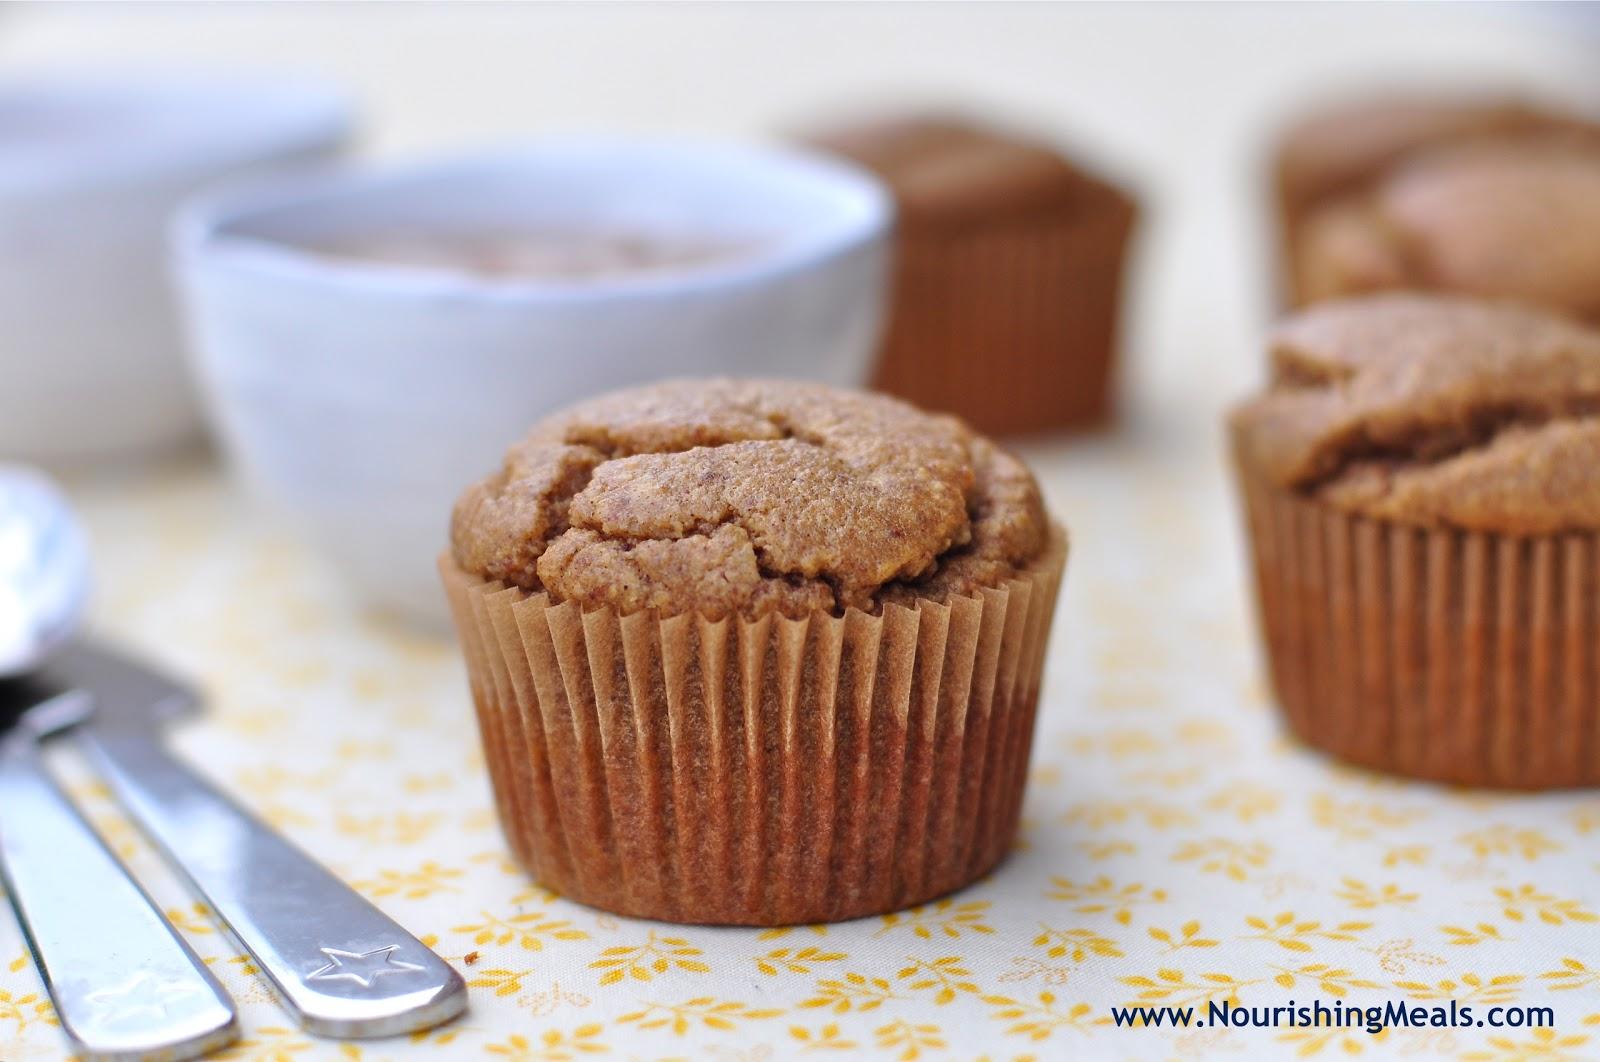 ... : Banana Almond Butter Muffins (gluten-free, grain-free, dairy-free